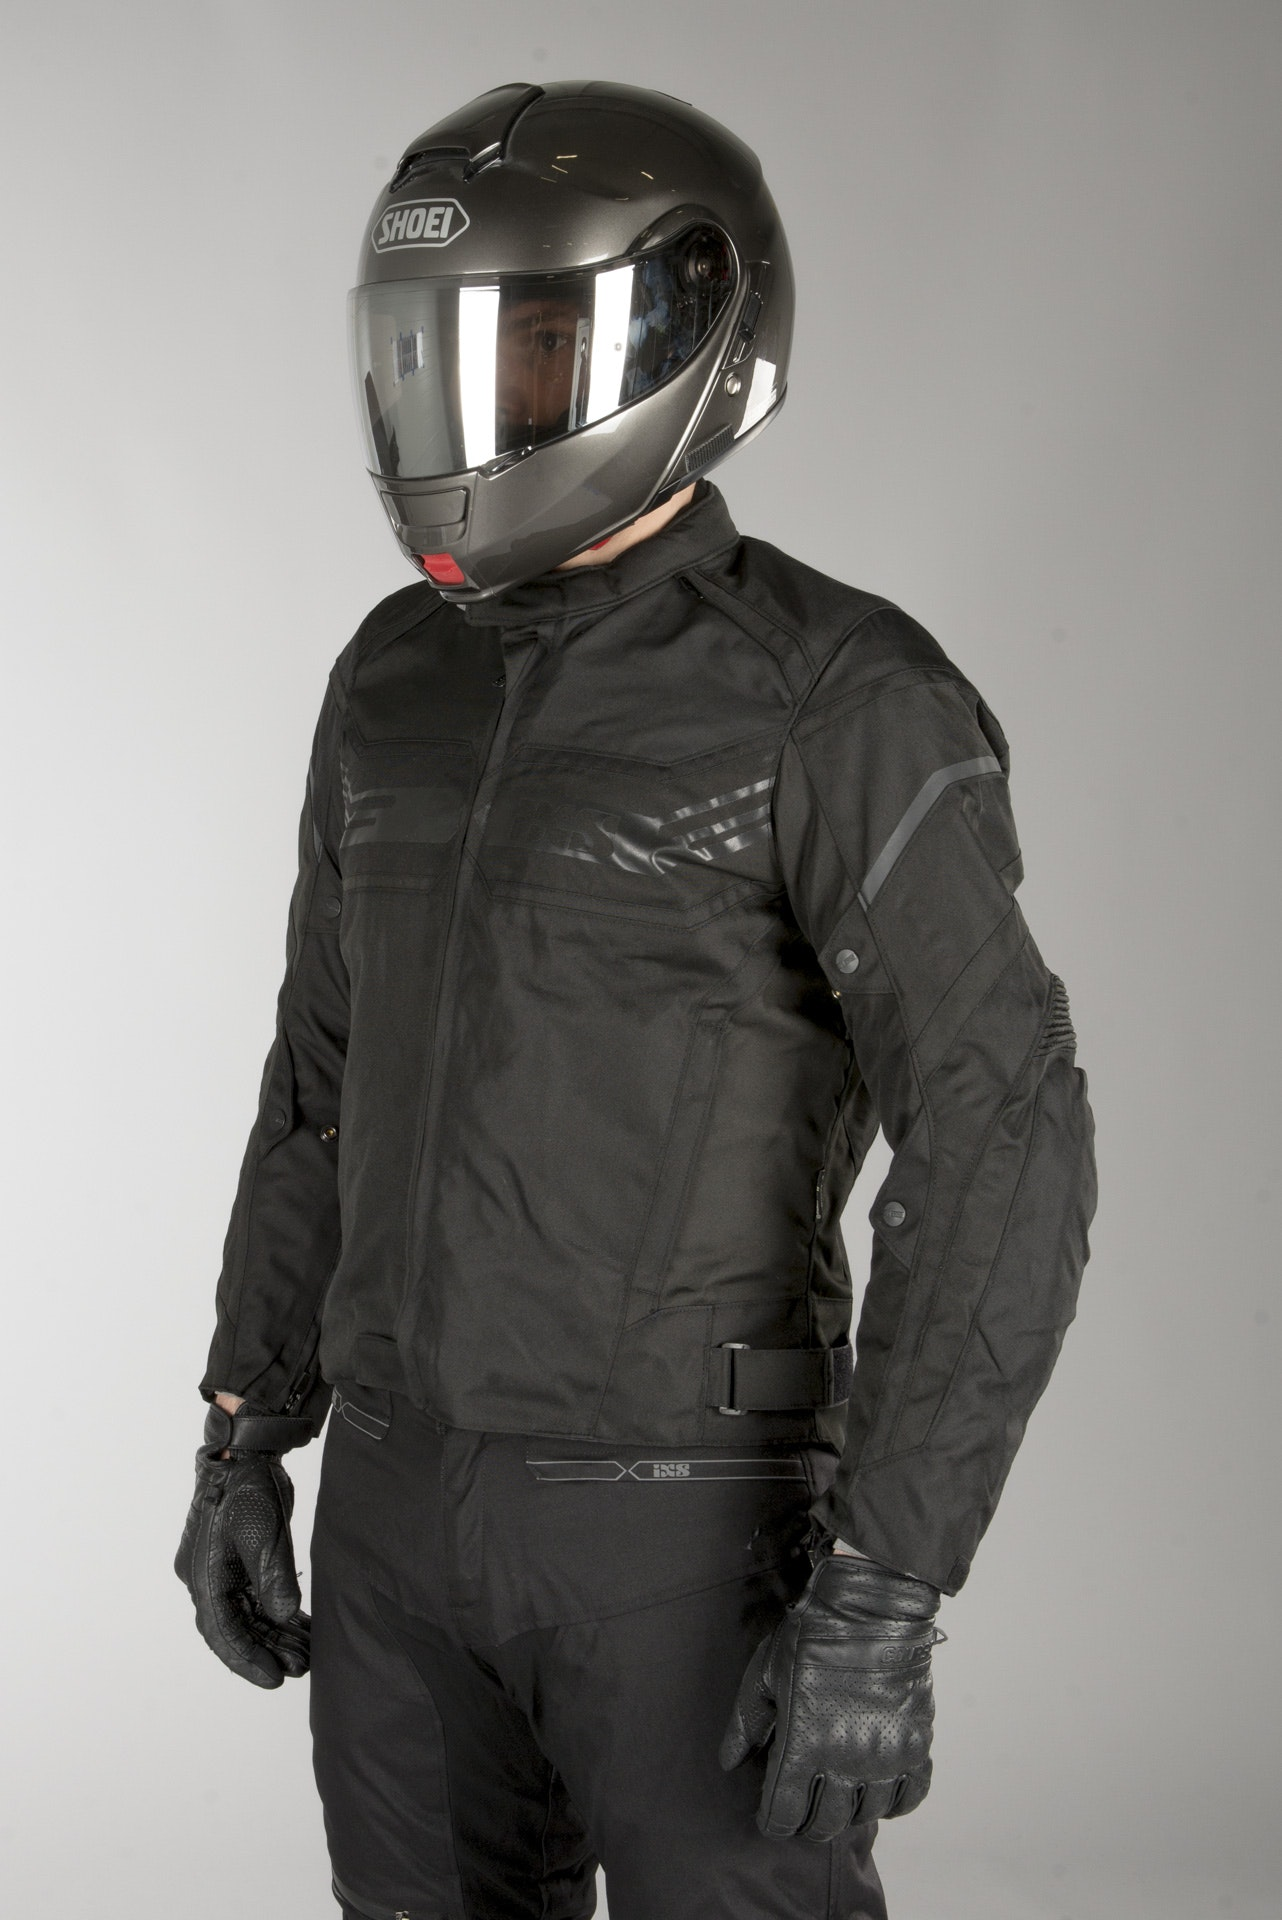 Polyester Herren IXS Motorradjacke mit Protektoren Motorrad Jacke RS-400-ST 2.0 Sport Textiljacke Ganzj/ährig Sportler